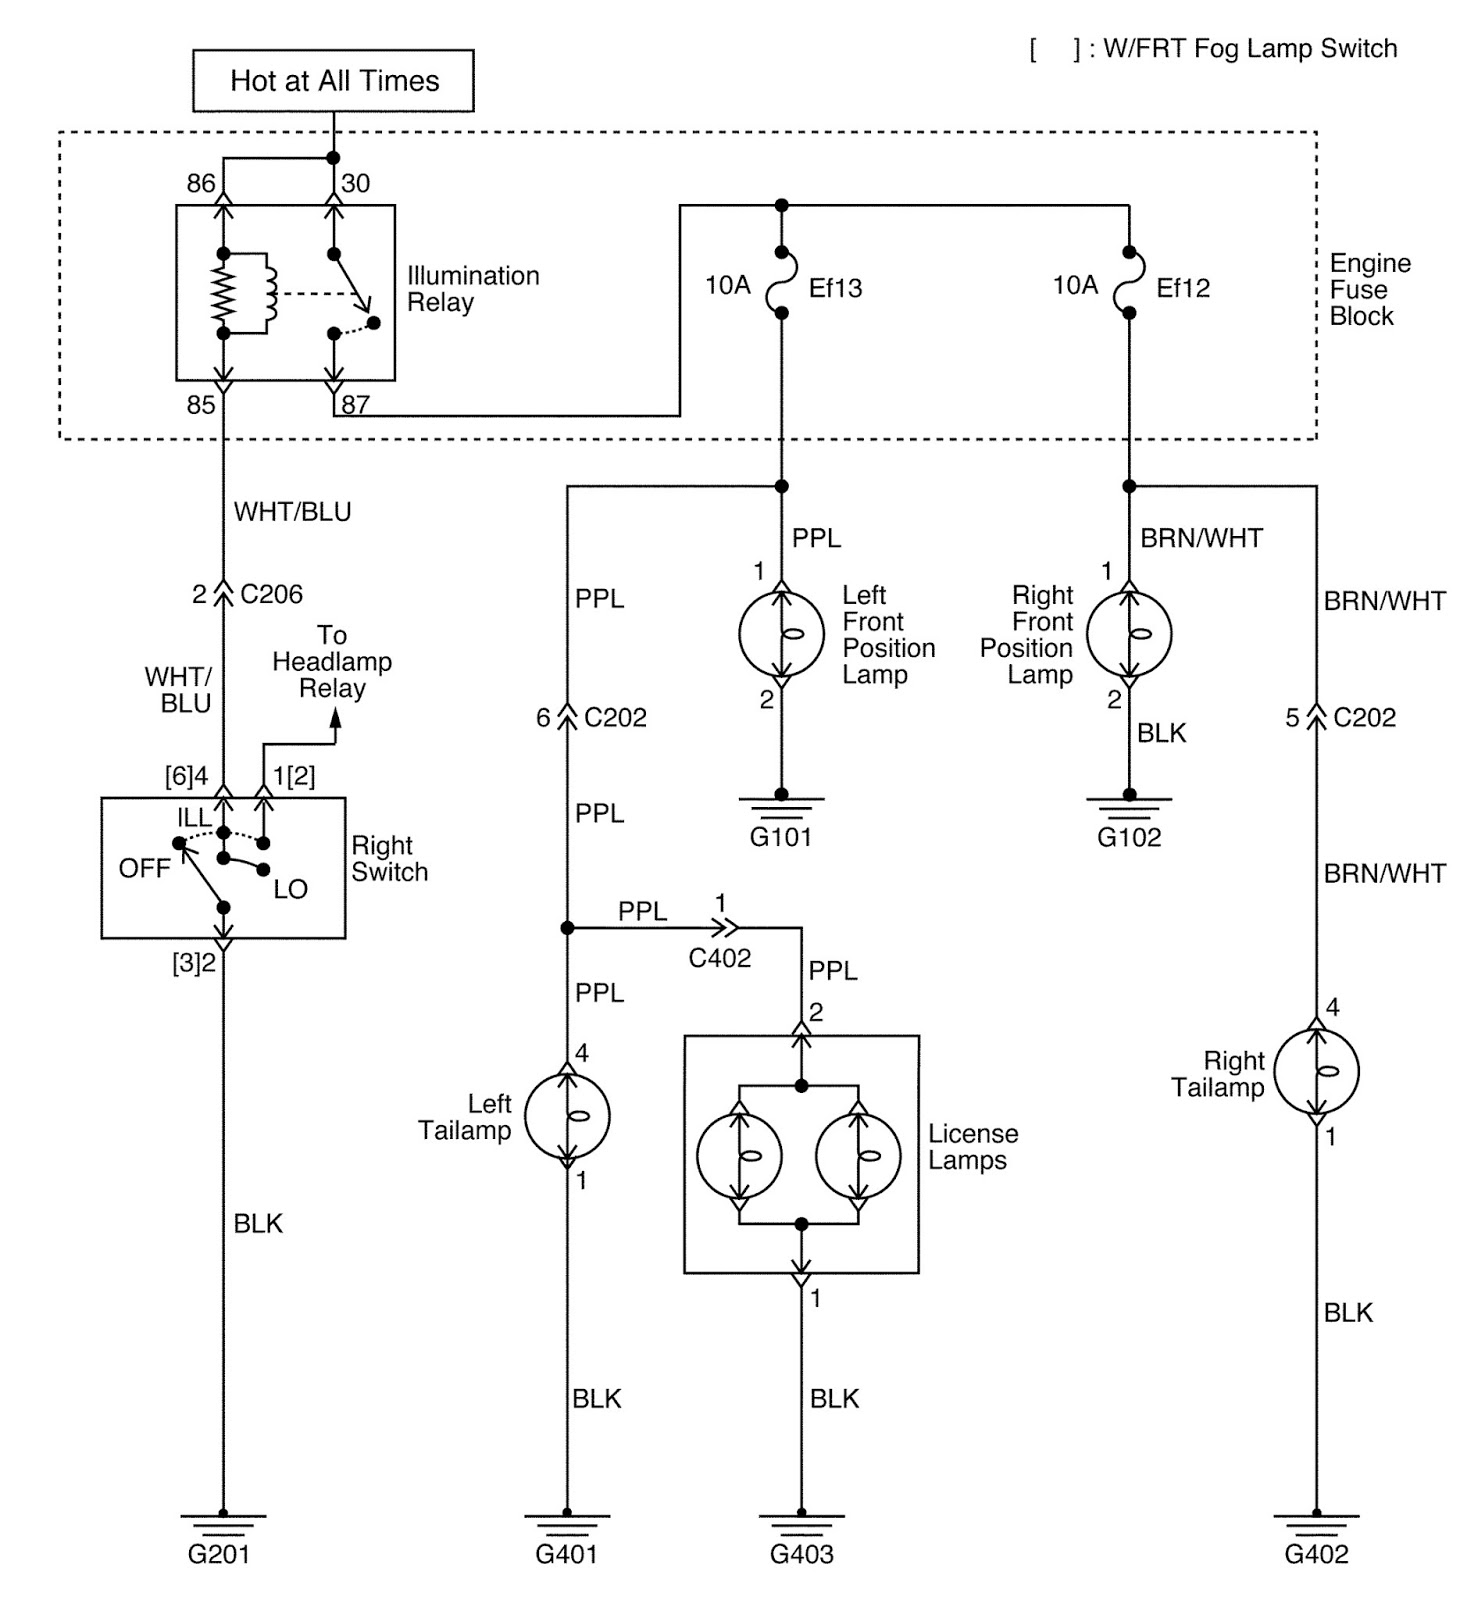 daewoo lanos wiring diagram avital remote start and schematics 2001 fuse library